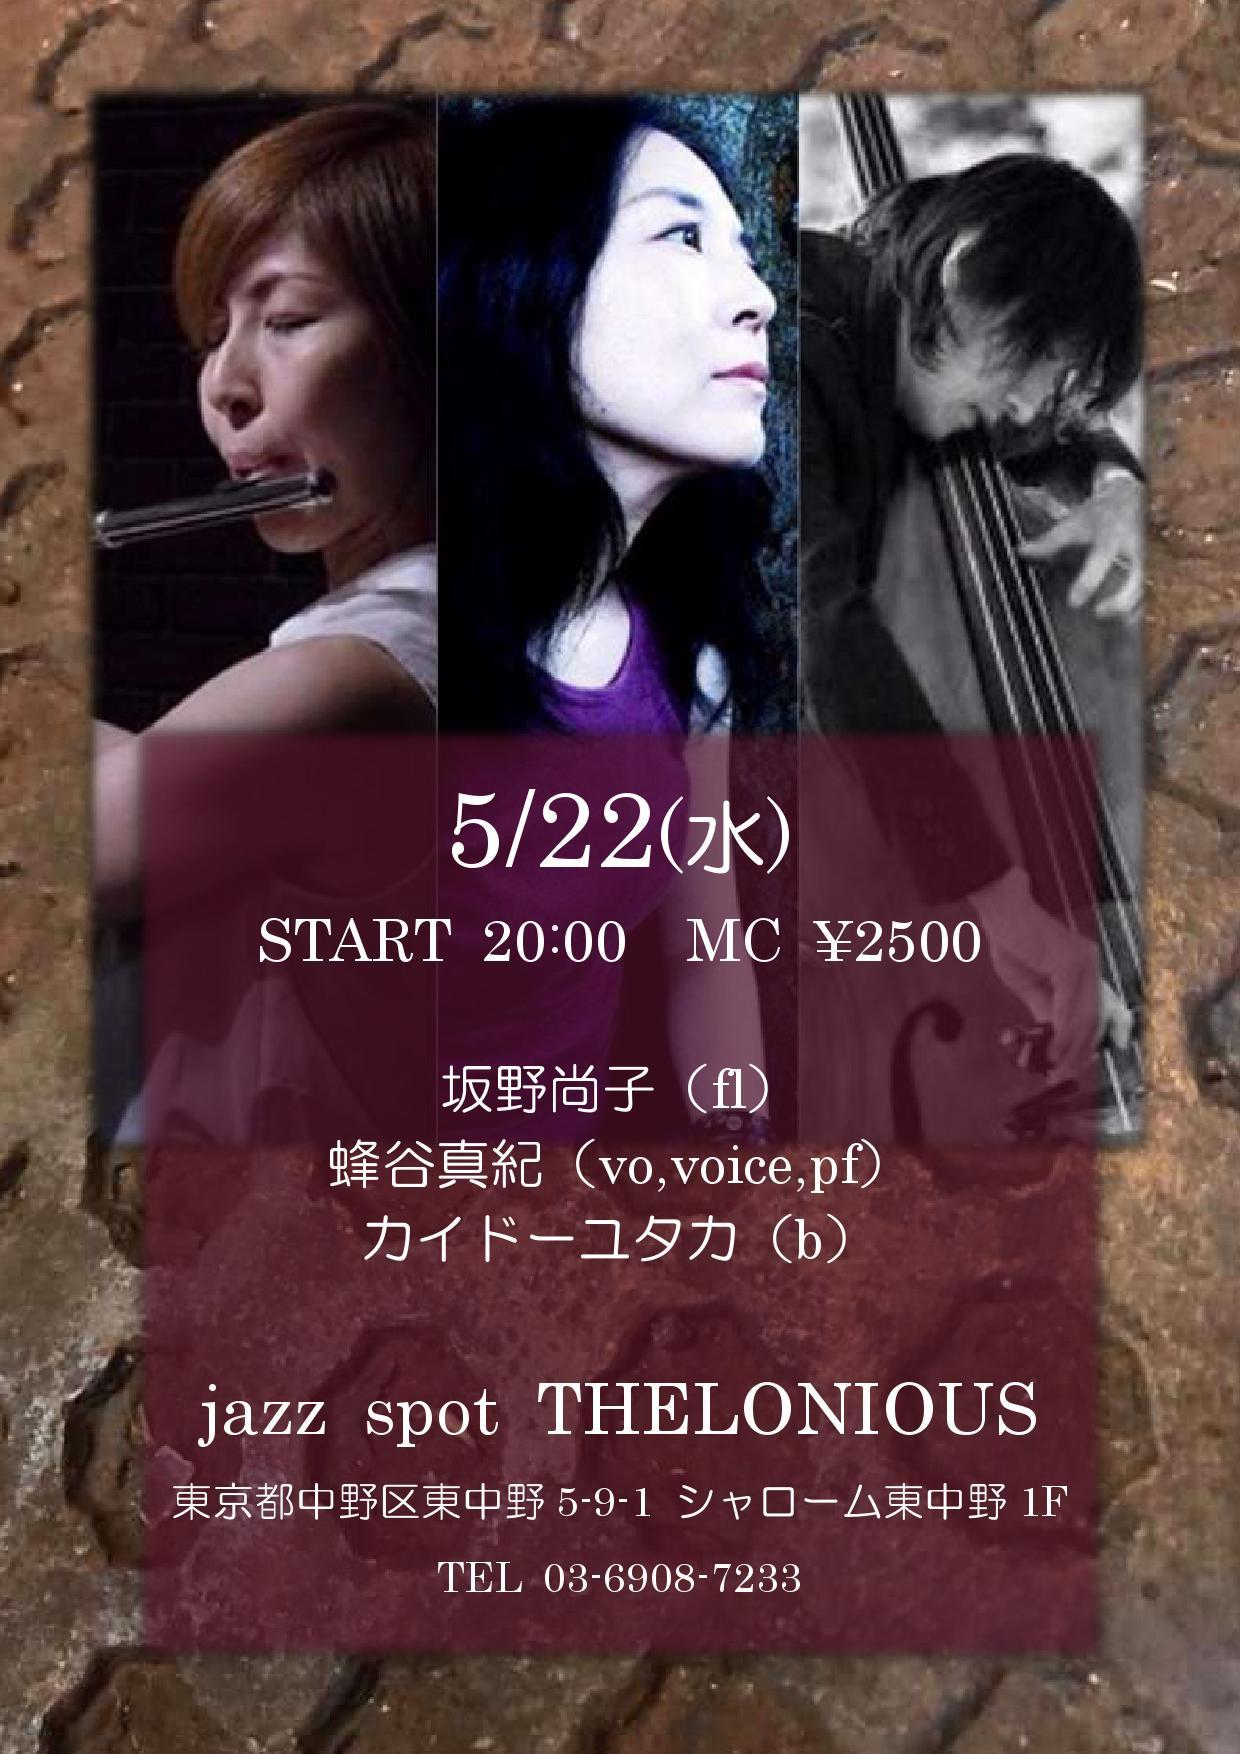 蜂谷真紀 Maki Hachiya 2019:5月~6月 live schedule_d0239981_16291523.jpg